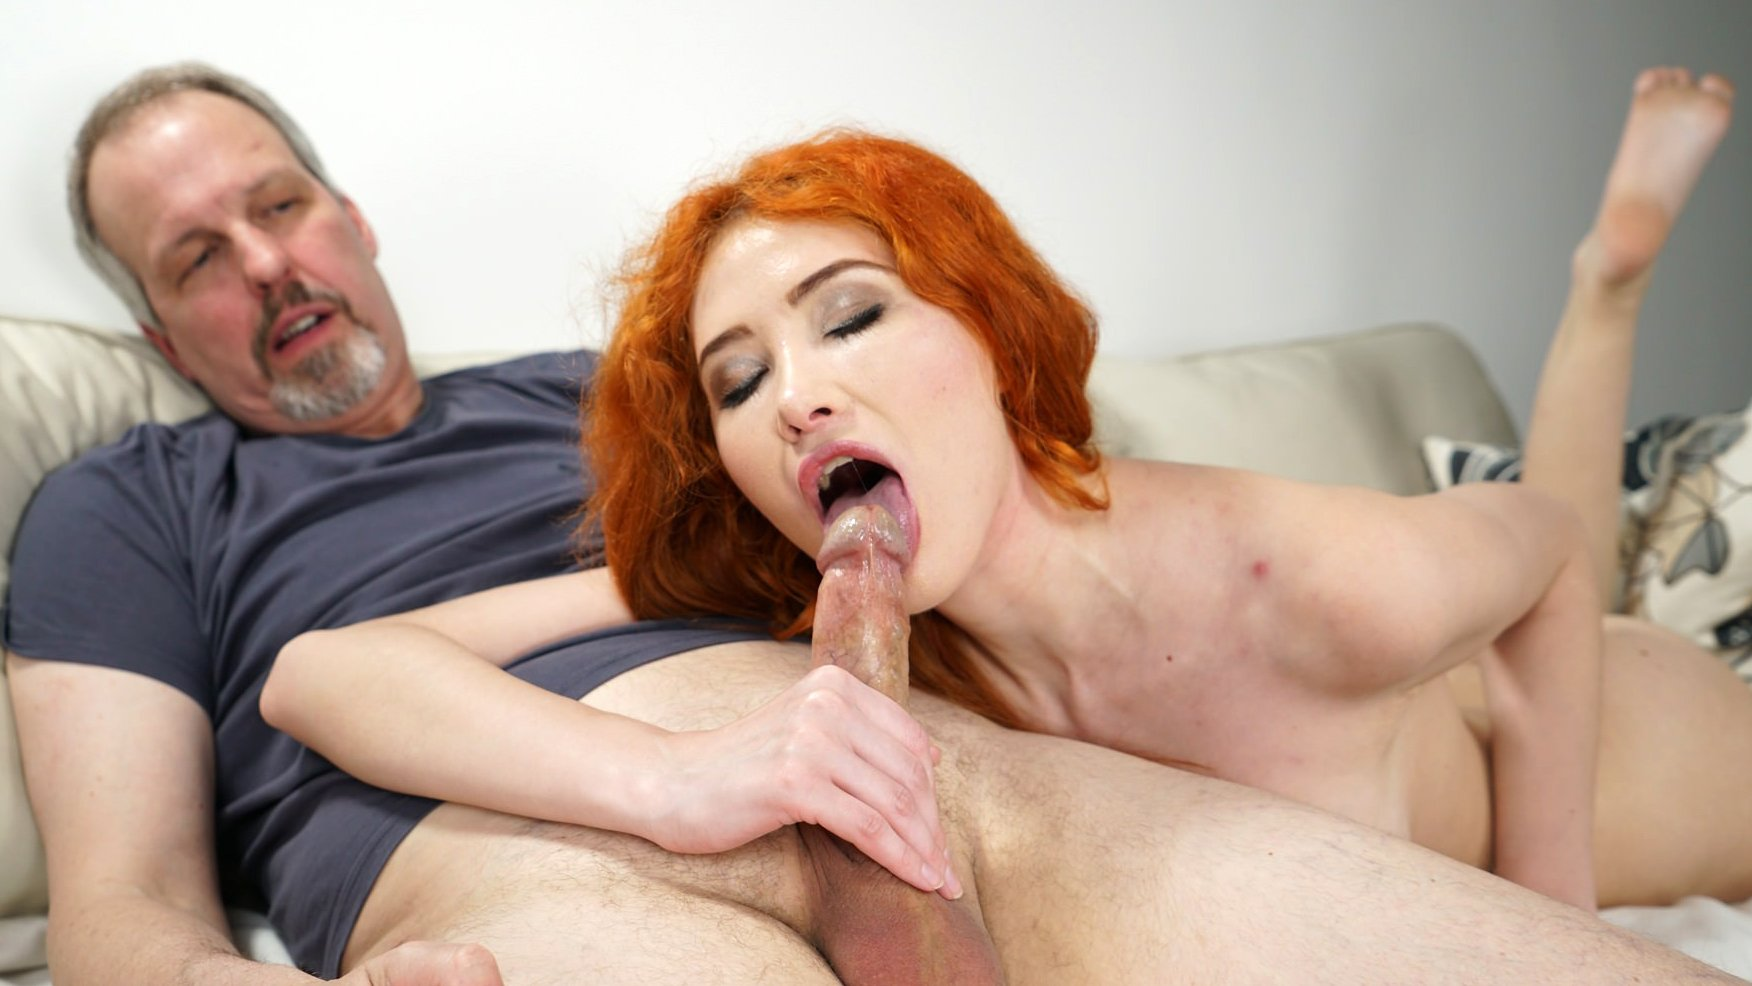 Dirty redhead babe enjoys sex tnaflix porn pics